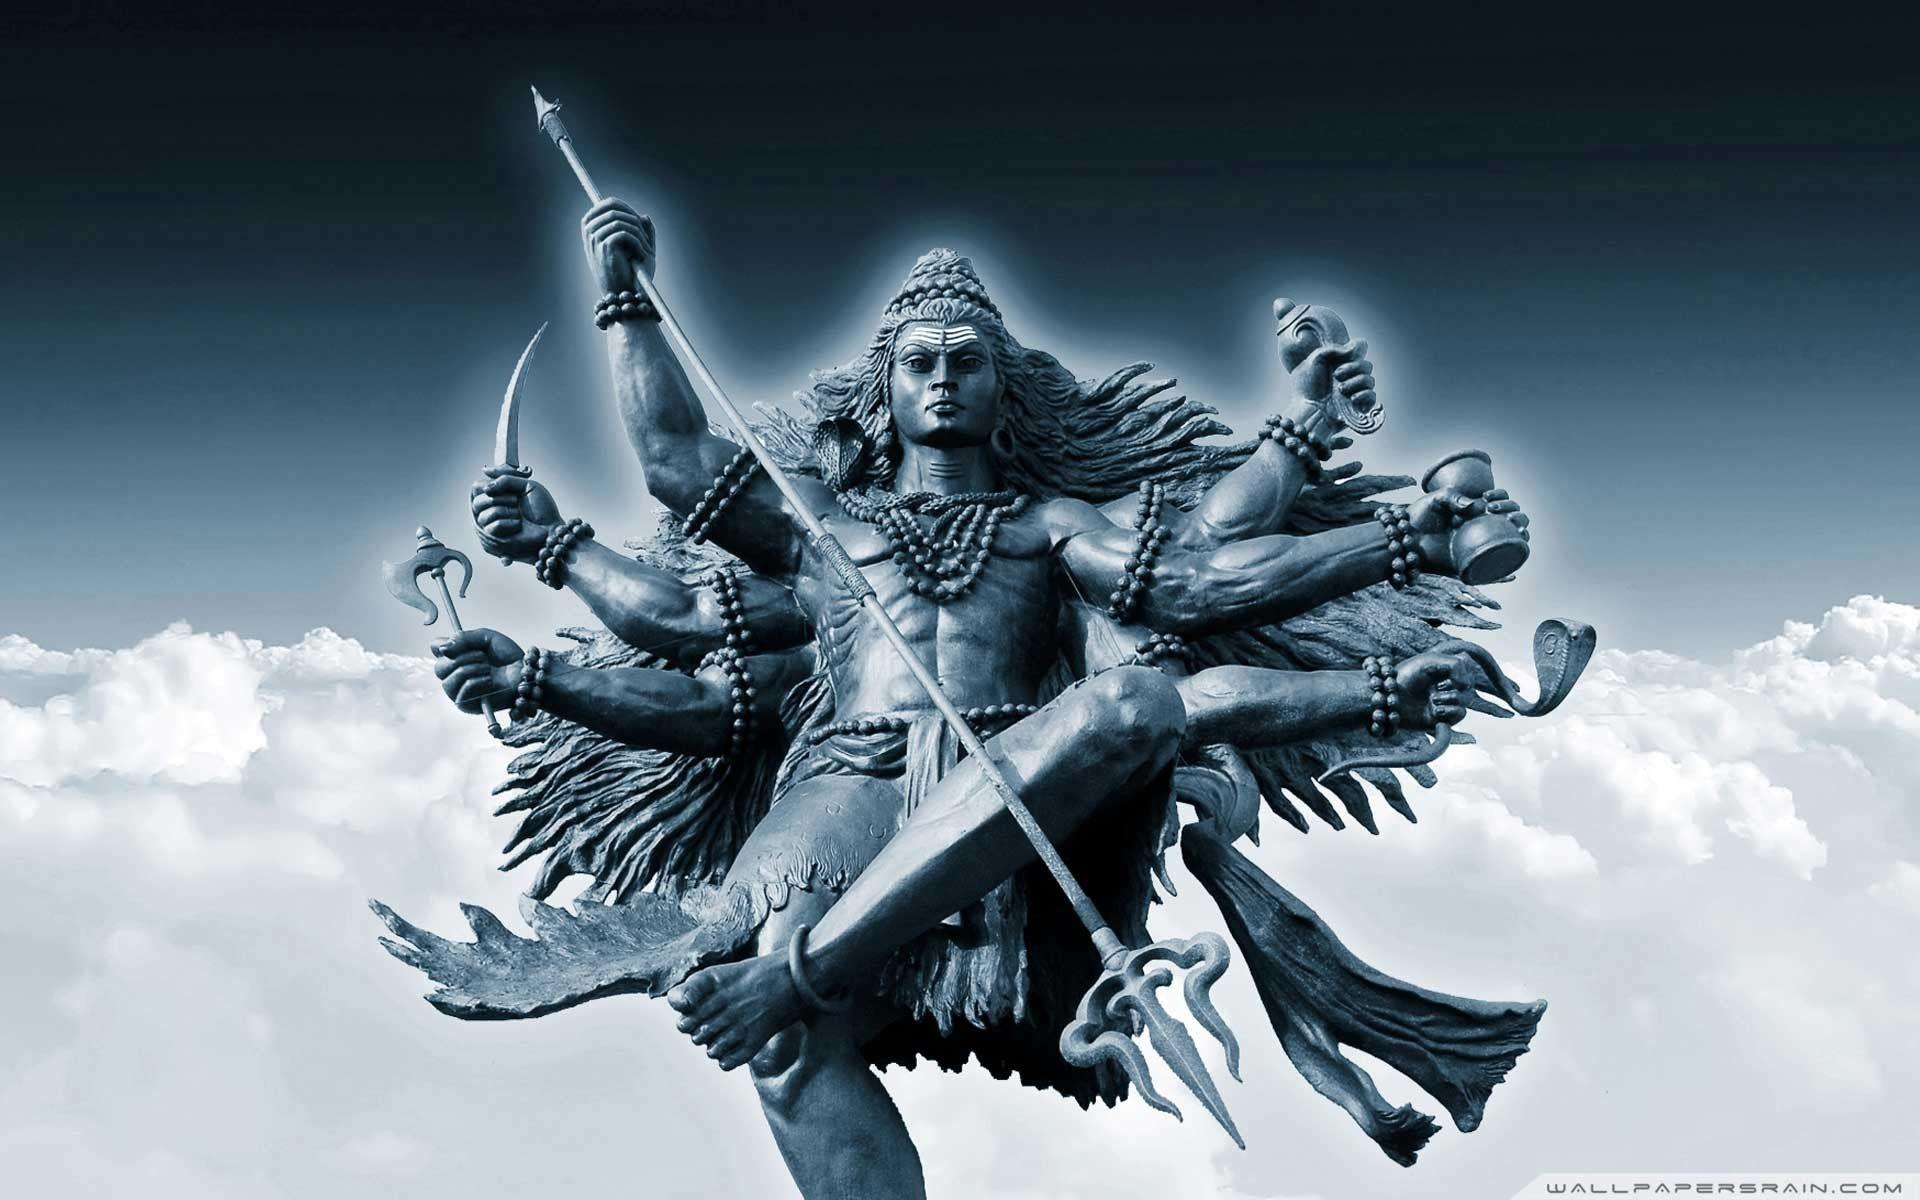 1920x1200 Lord Shiva Wallpaper Hd Image 6 Shiva Wallpaper Shiva Angry Lord Shiva Hd Wallpaper